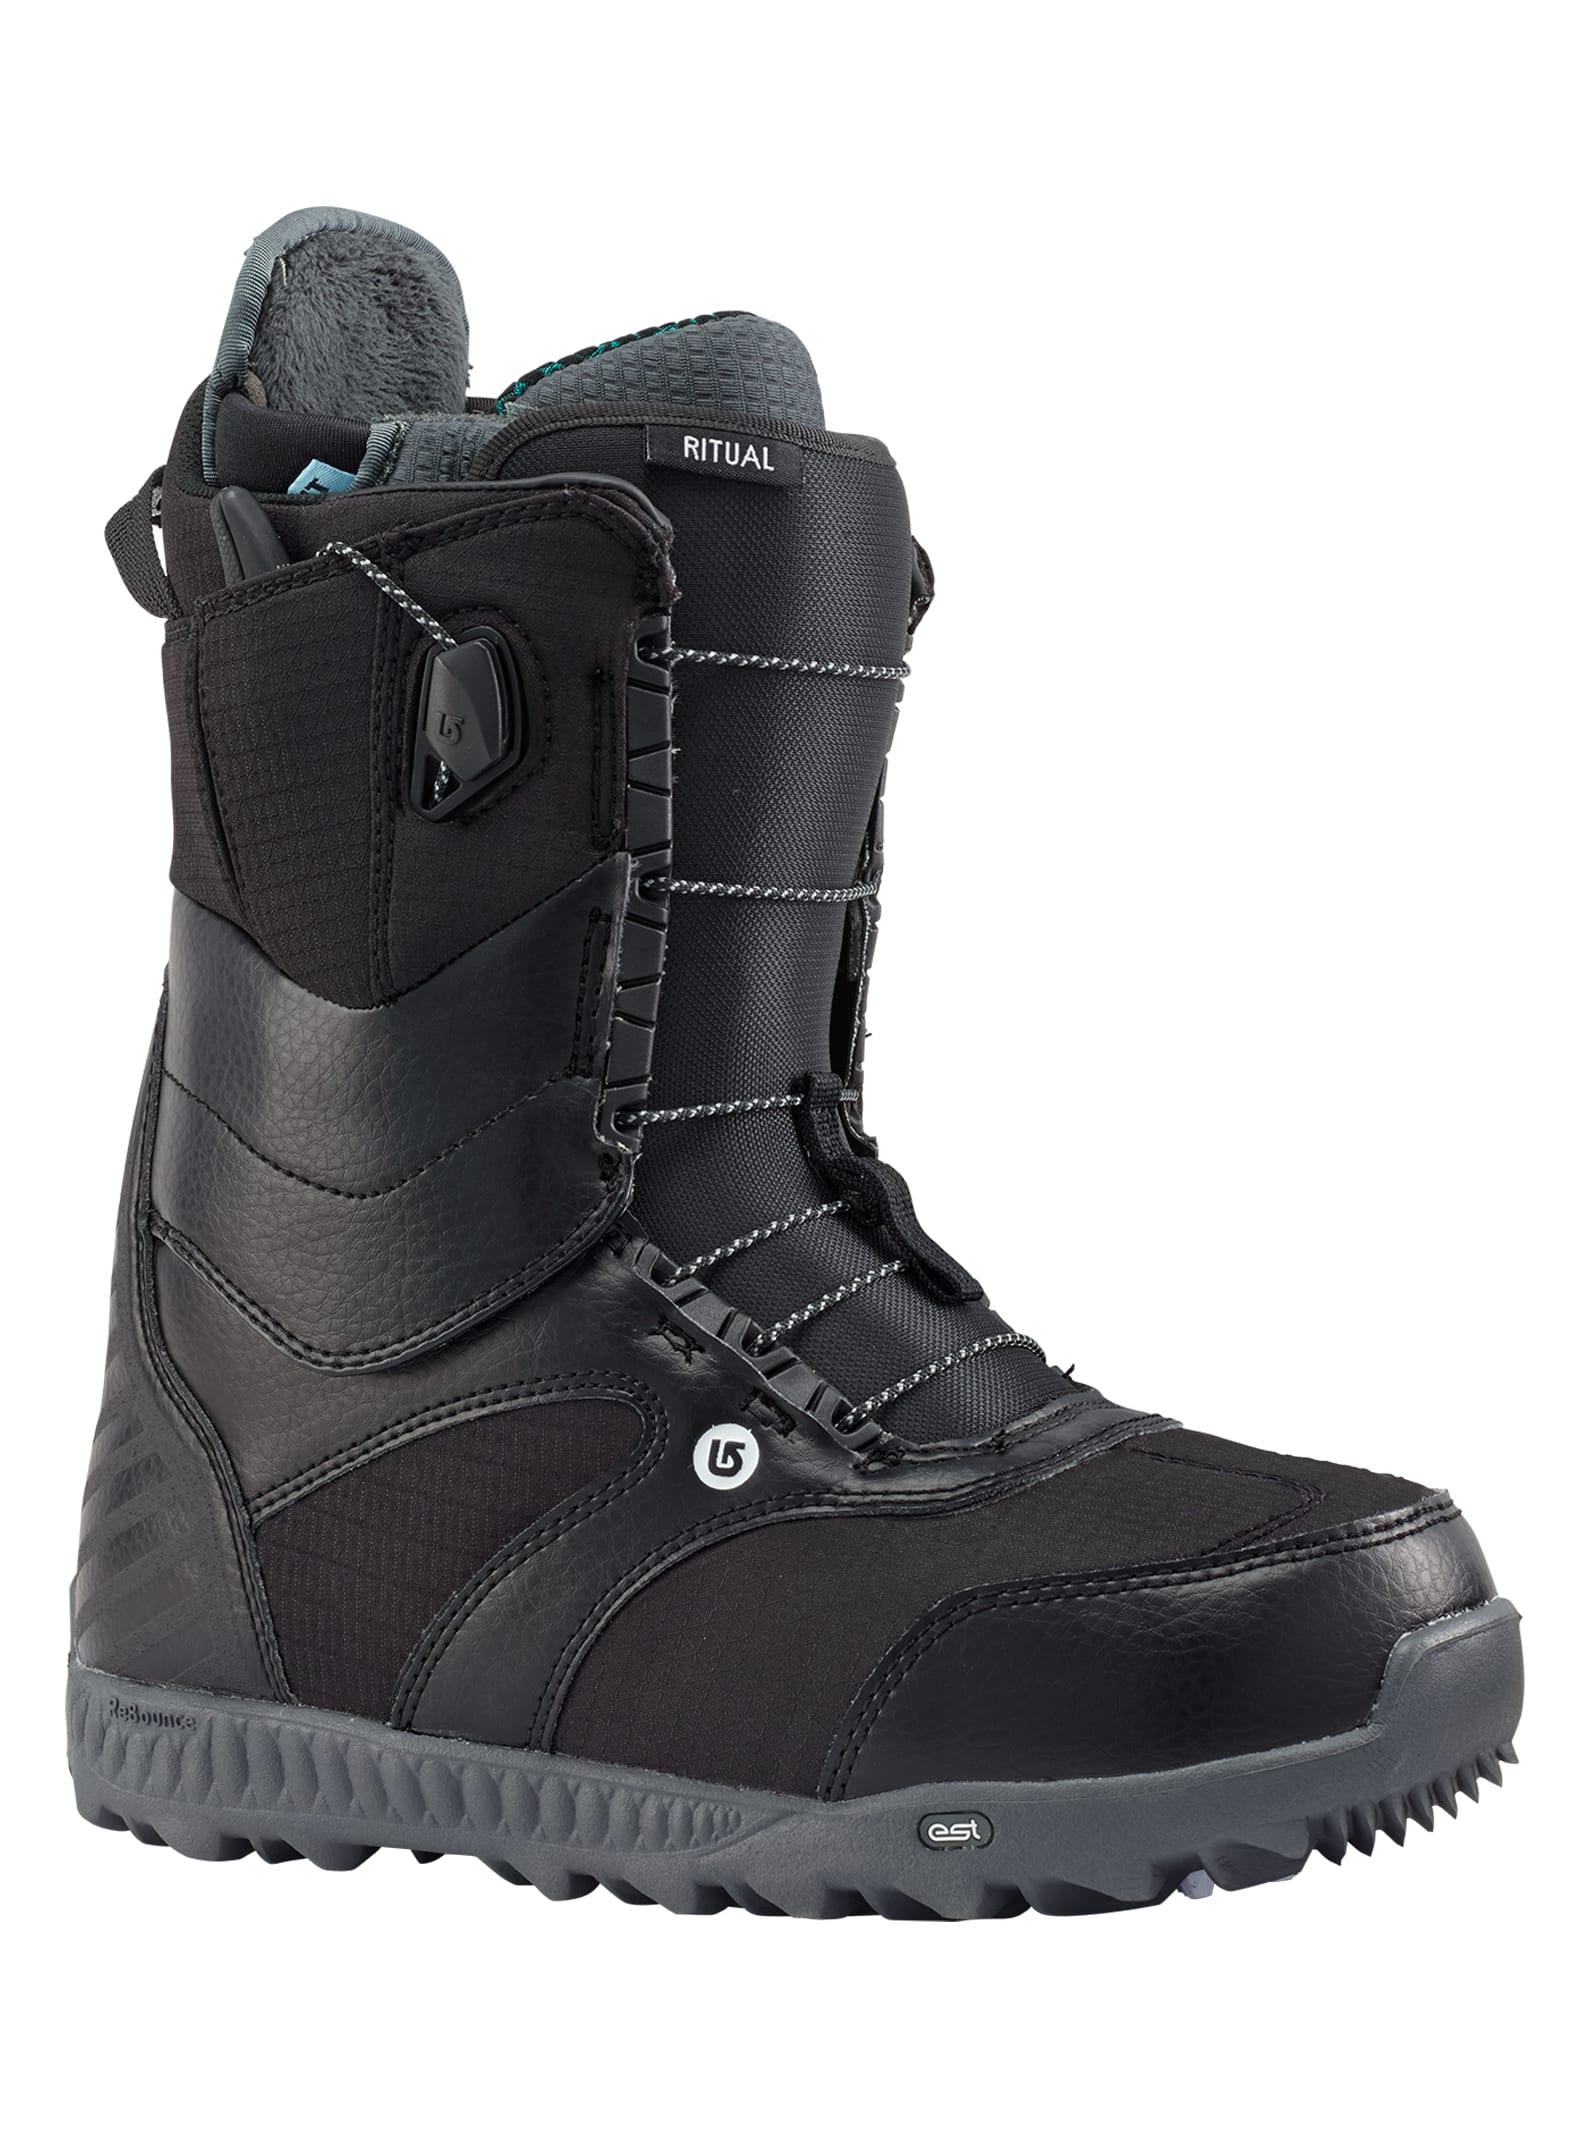 100% authentic 96195 6107e Burton - Boots de snowboard Ritual femme   Snowboards Burton hiver 202018